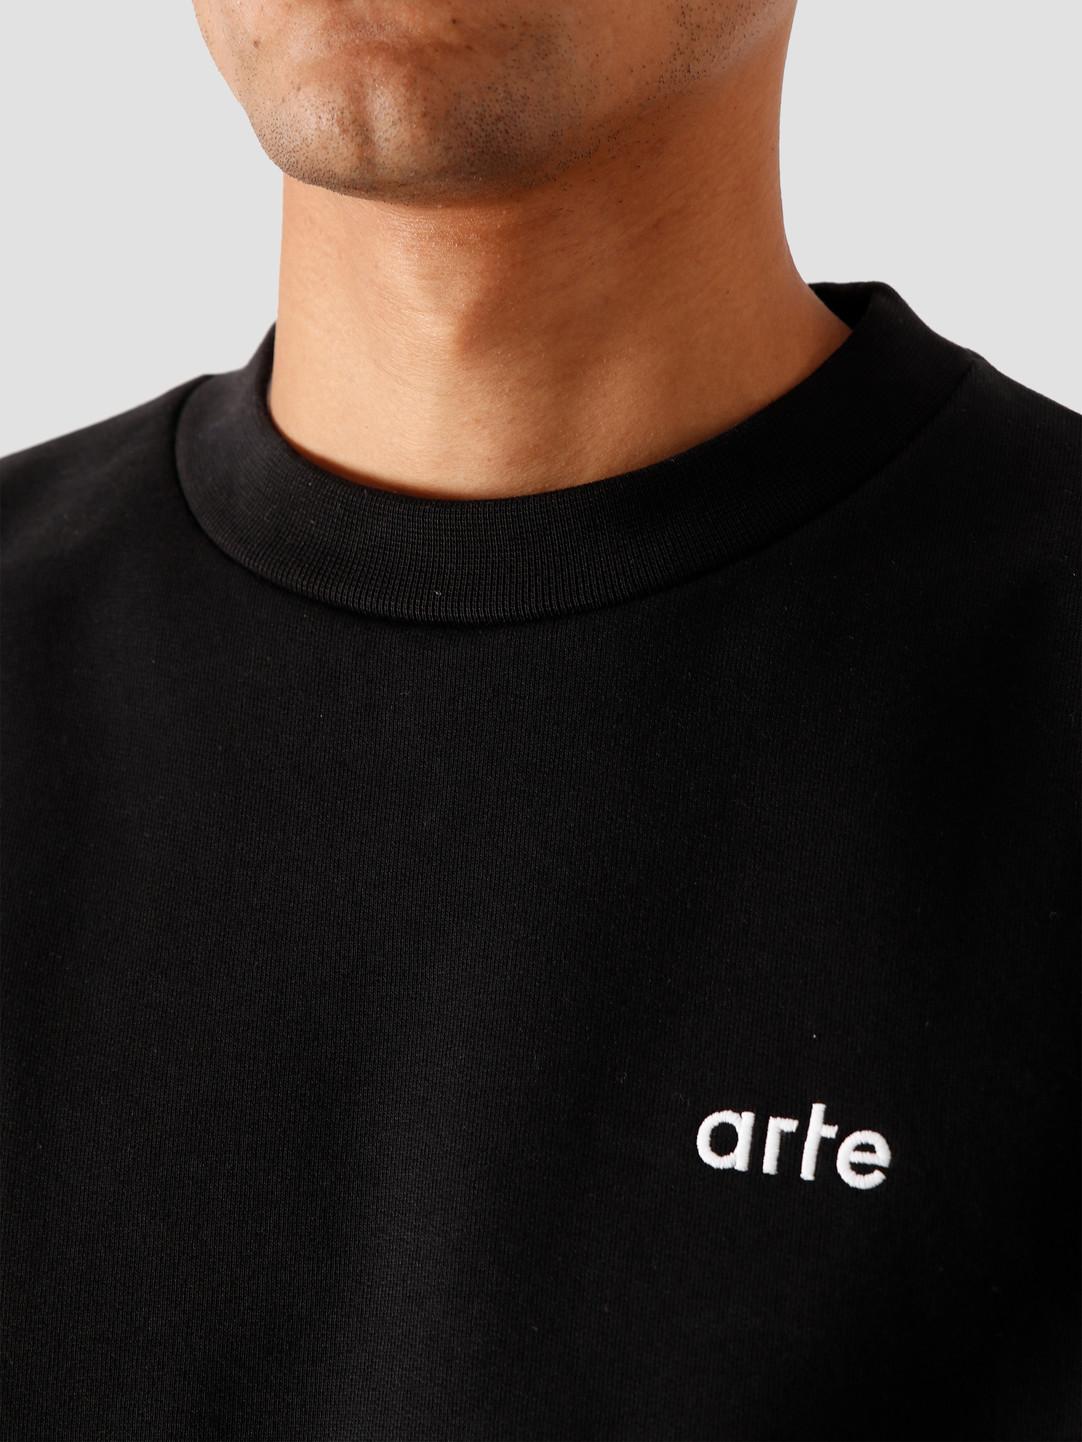 Arte Antwerp Arte Antwerp Chuck Sweater Black AW20-044C